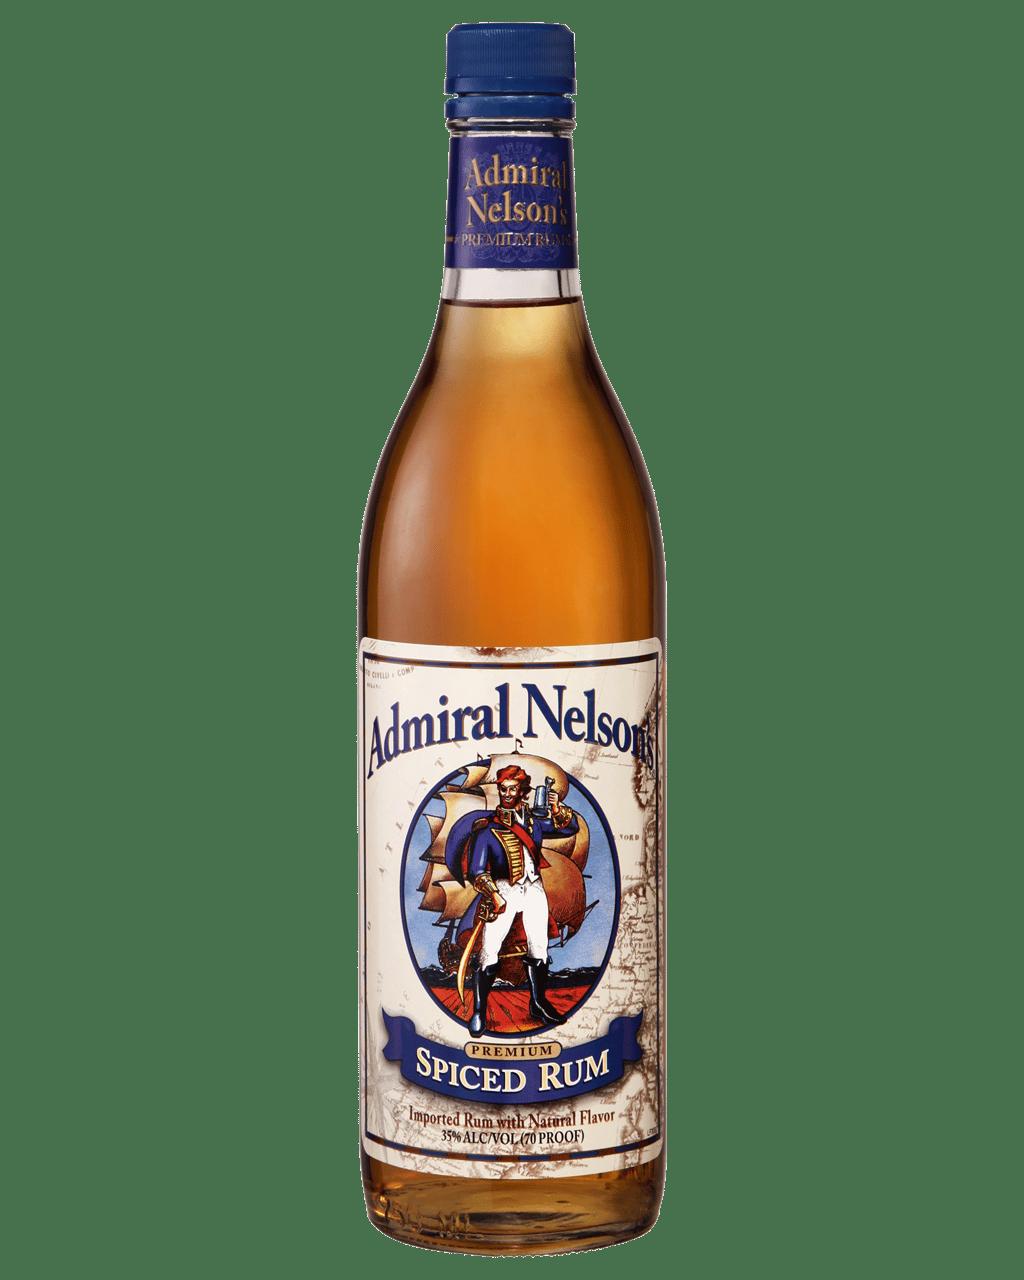 Admiral Nelsons Premium Spiced Rum 700mL